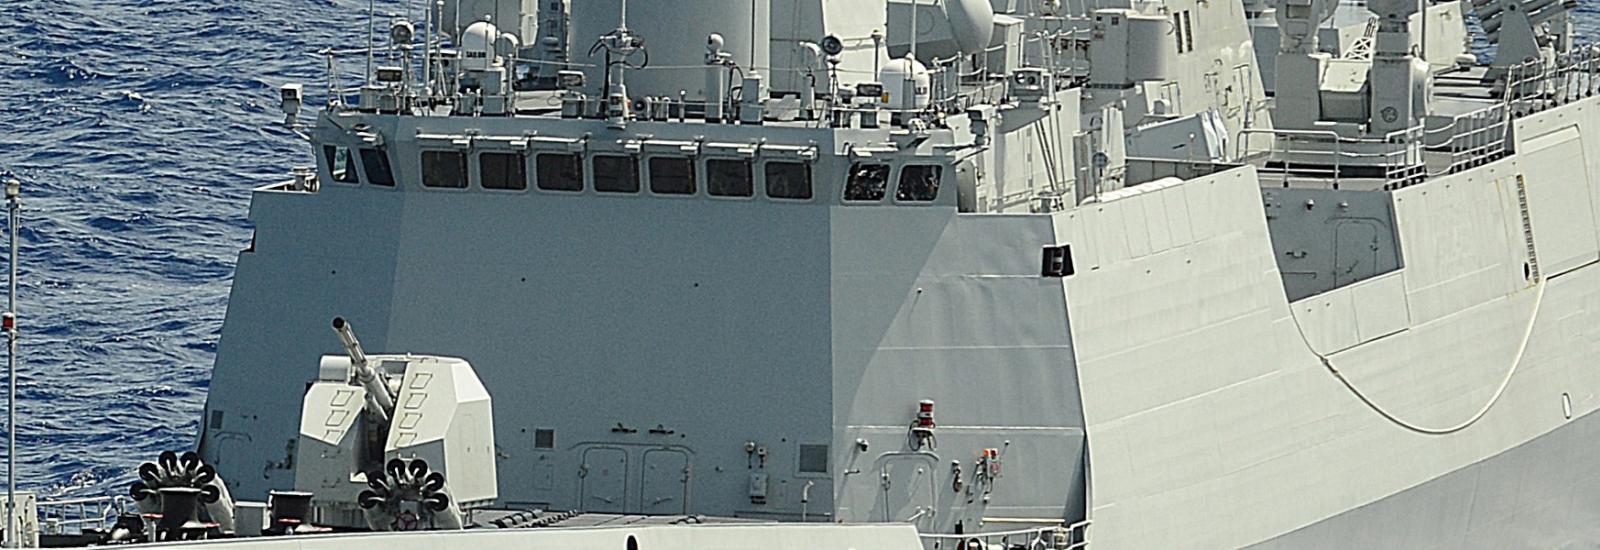 ©U.S. Navy photo by Mass Communication Specialist 1st Class Shannon Renfroe